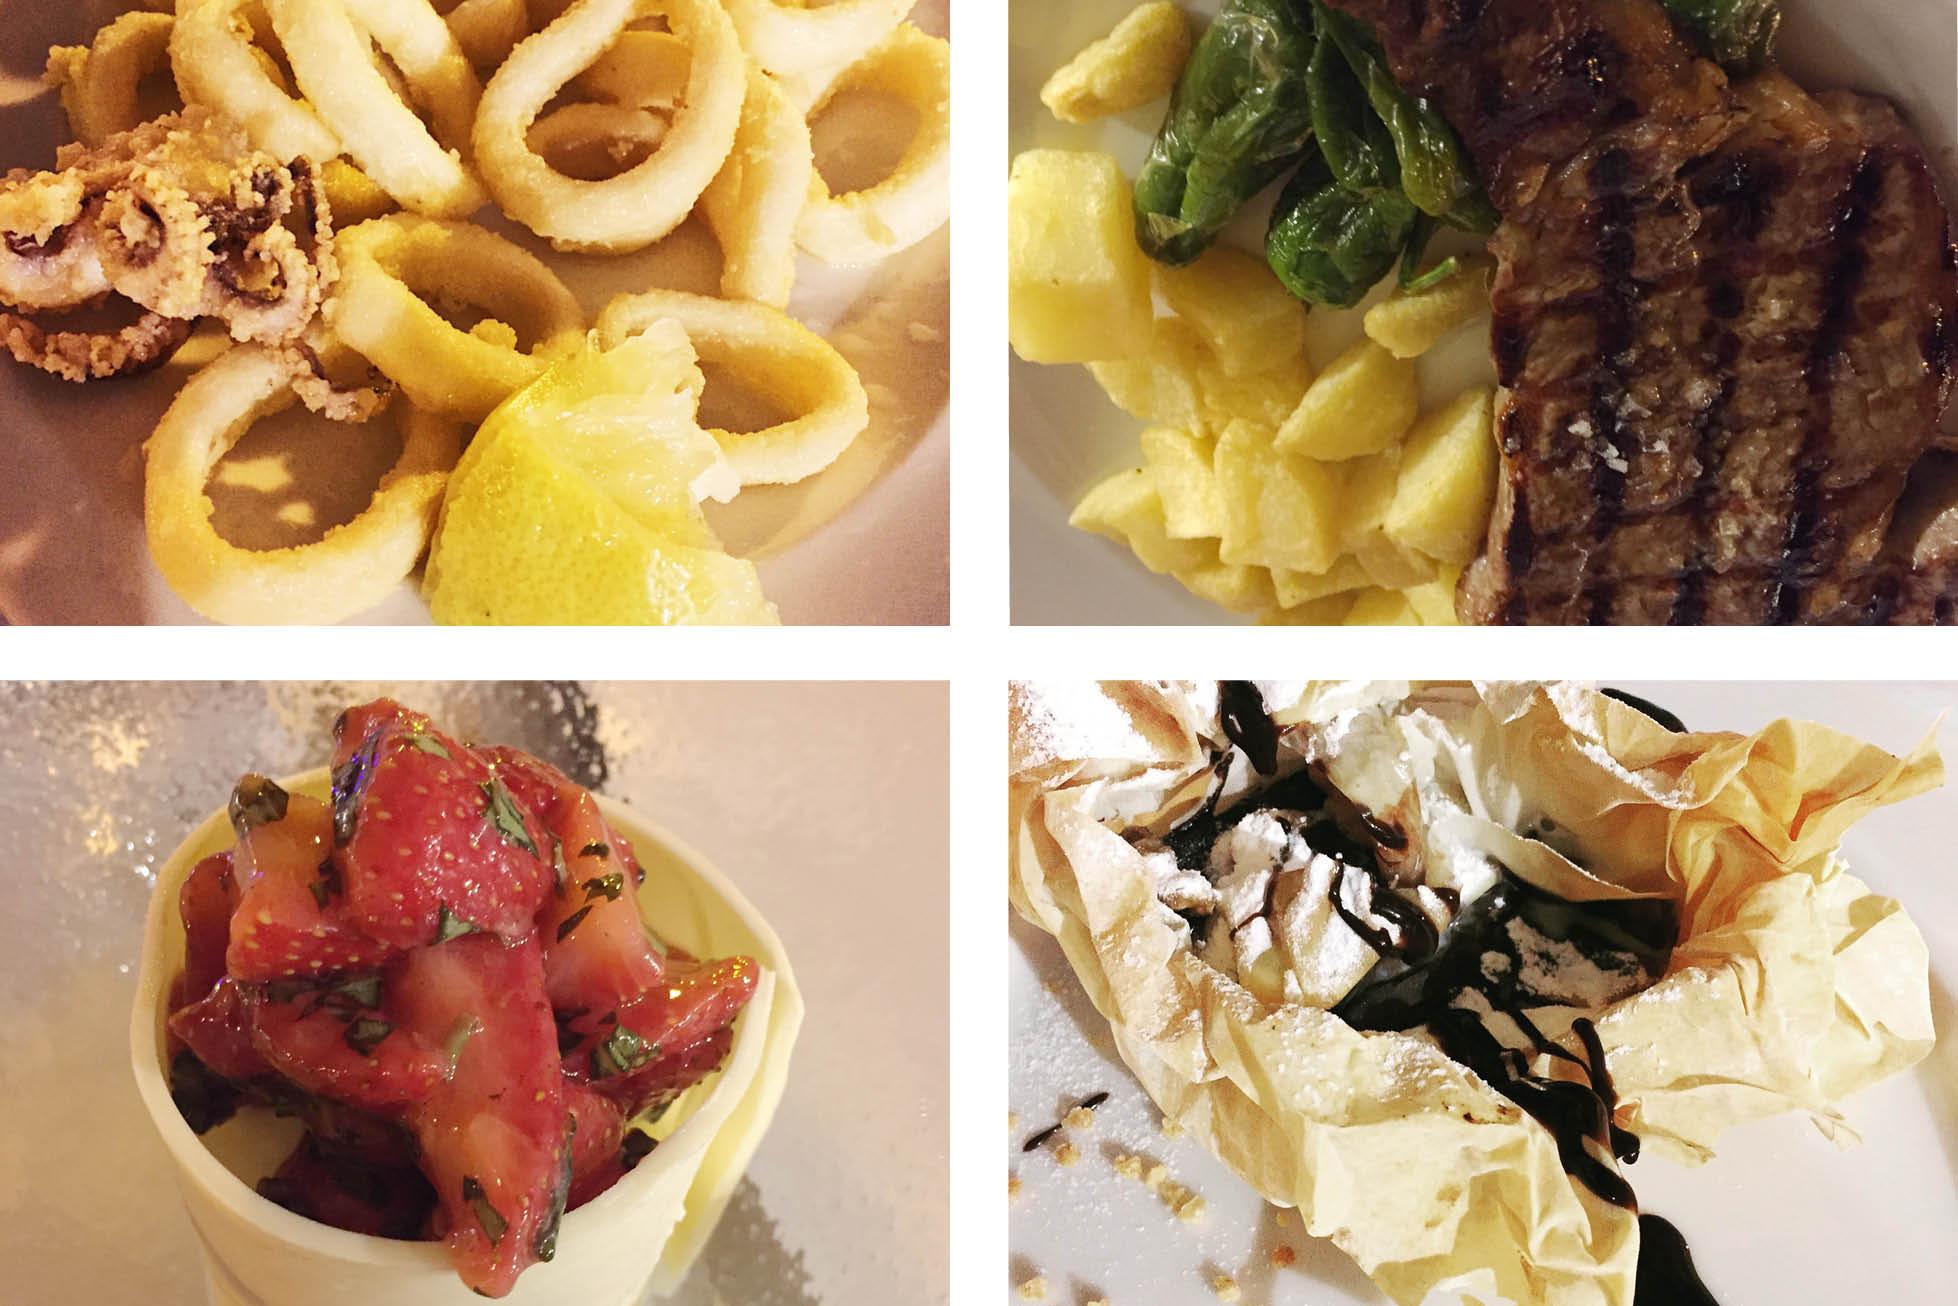 Café Balear restaurant dishes